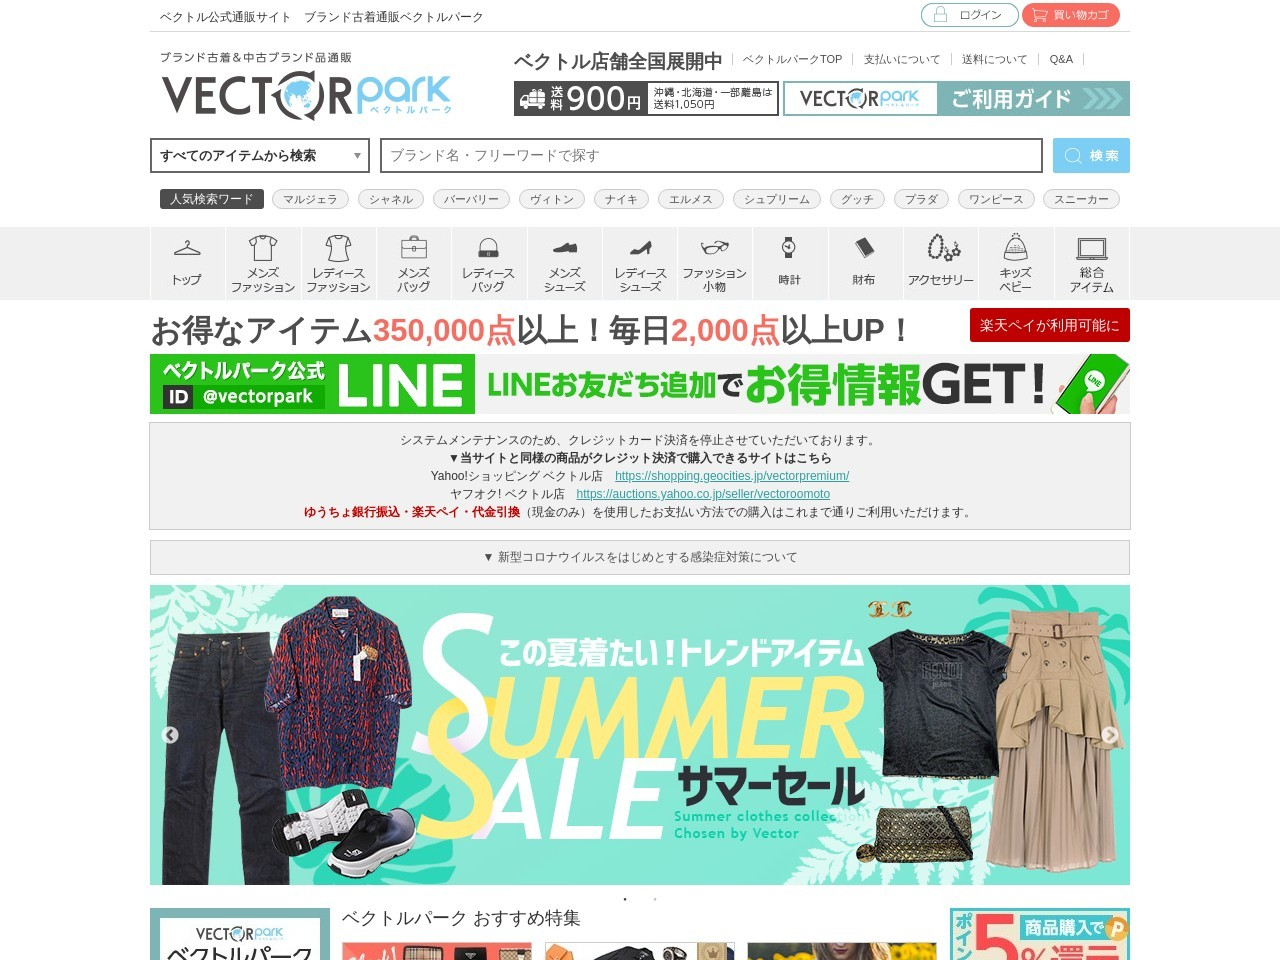 http://vector-park.jp/list/?kw=%A5%AF%A5%EA%A5%B9%A5%C1%A5%E3%A5%F3%A5%C7%A5%A3%A5%AA%A1%BC%A5%EB&cgt1=&send_sid=1